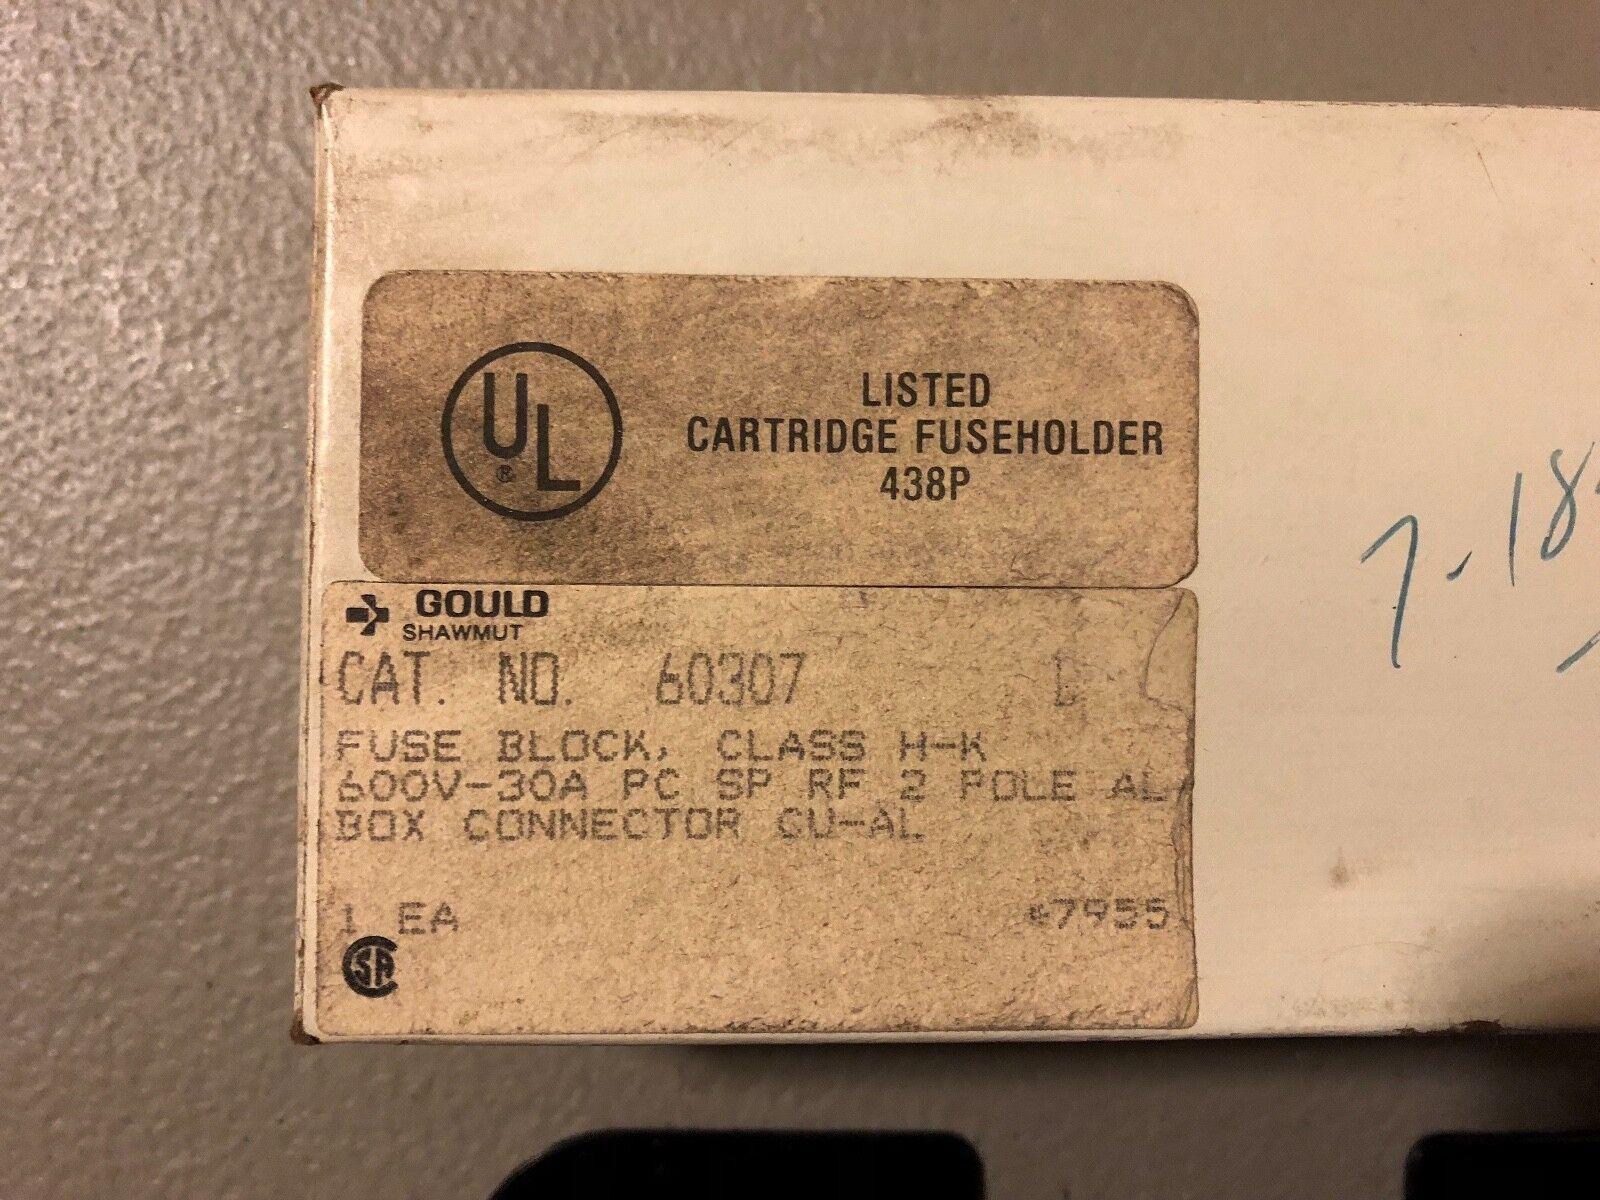 Gould Shawmut Fuse Holder 60307 600v 30a Ebay Box Cartridge Norton Secured Powered By Verisign